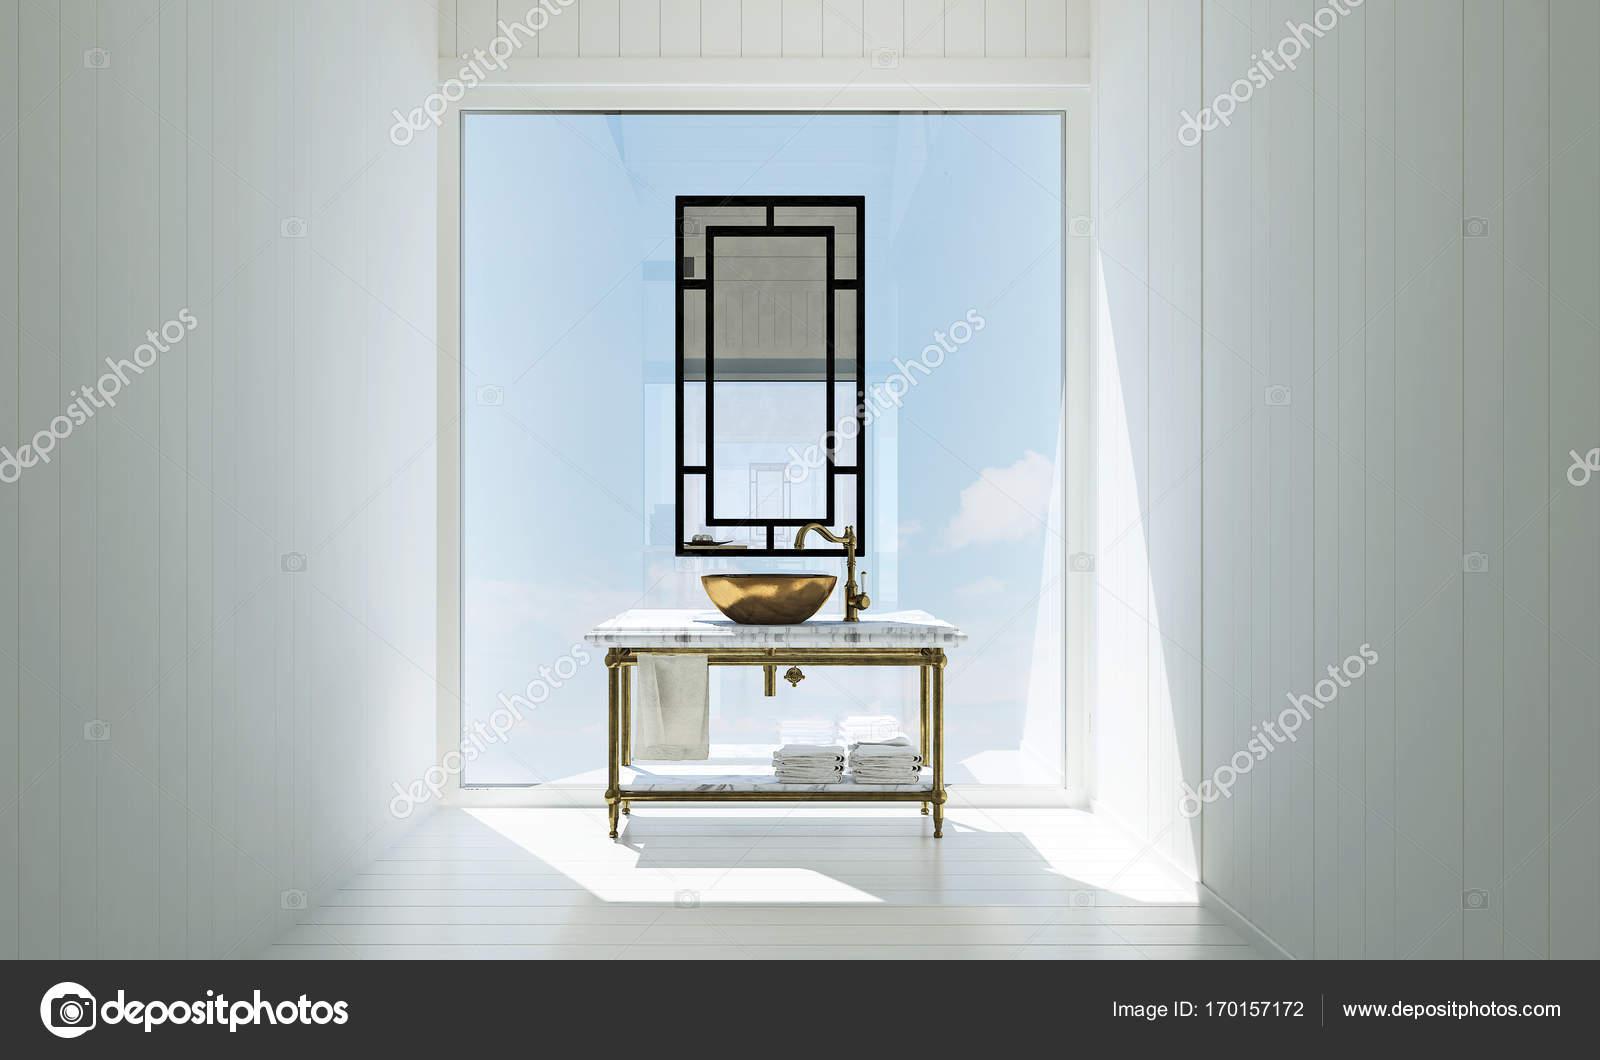 Beton Muur Badkamer : De witte badkamer interieur en beton muur textuur achtergrond en